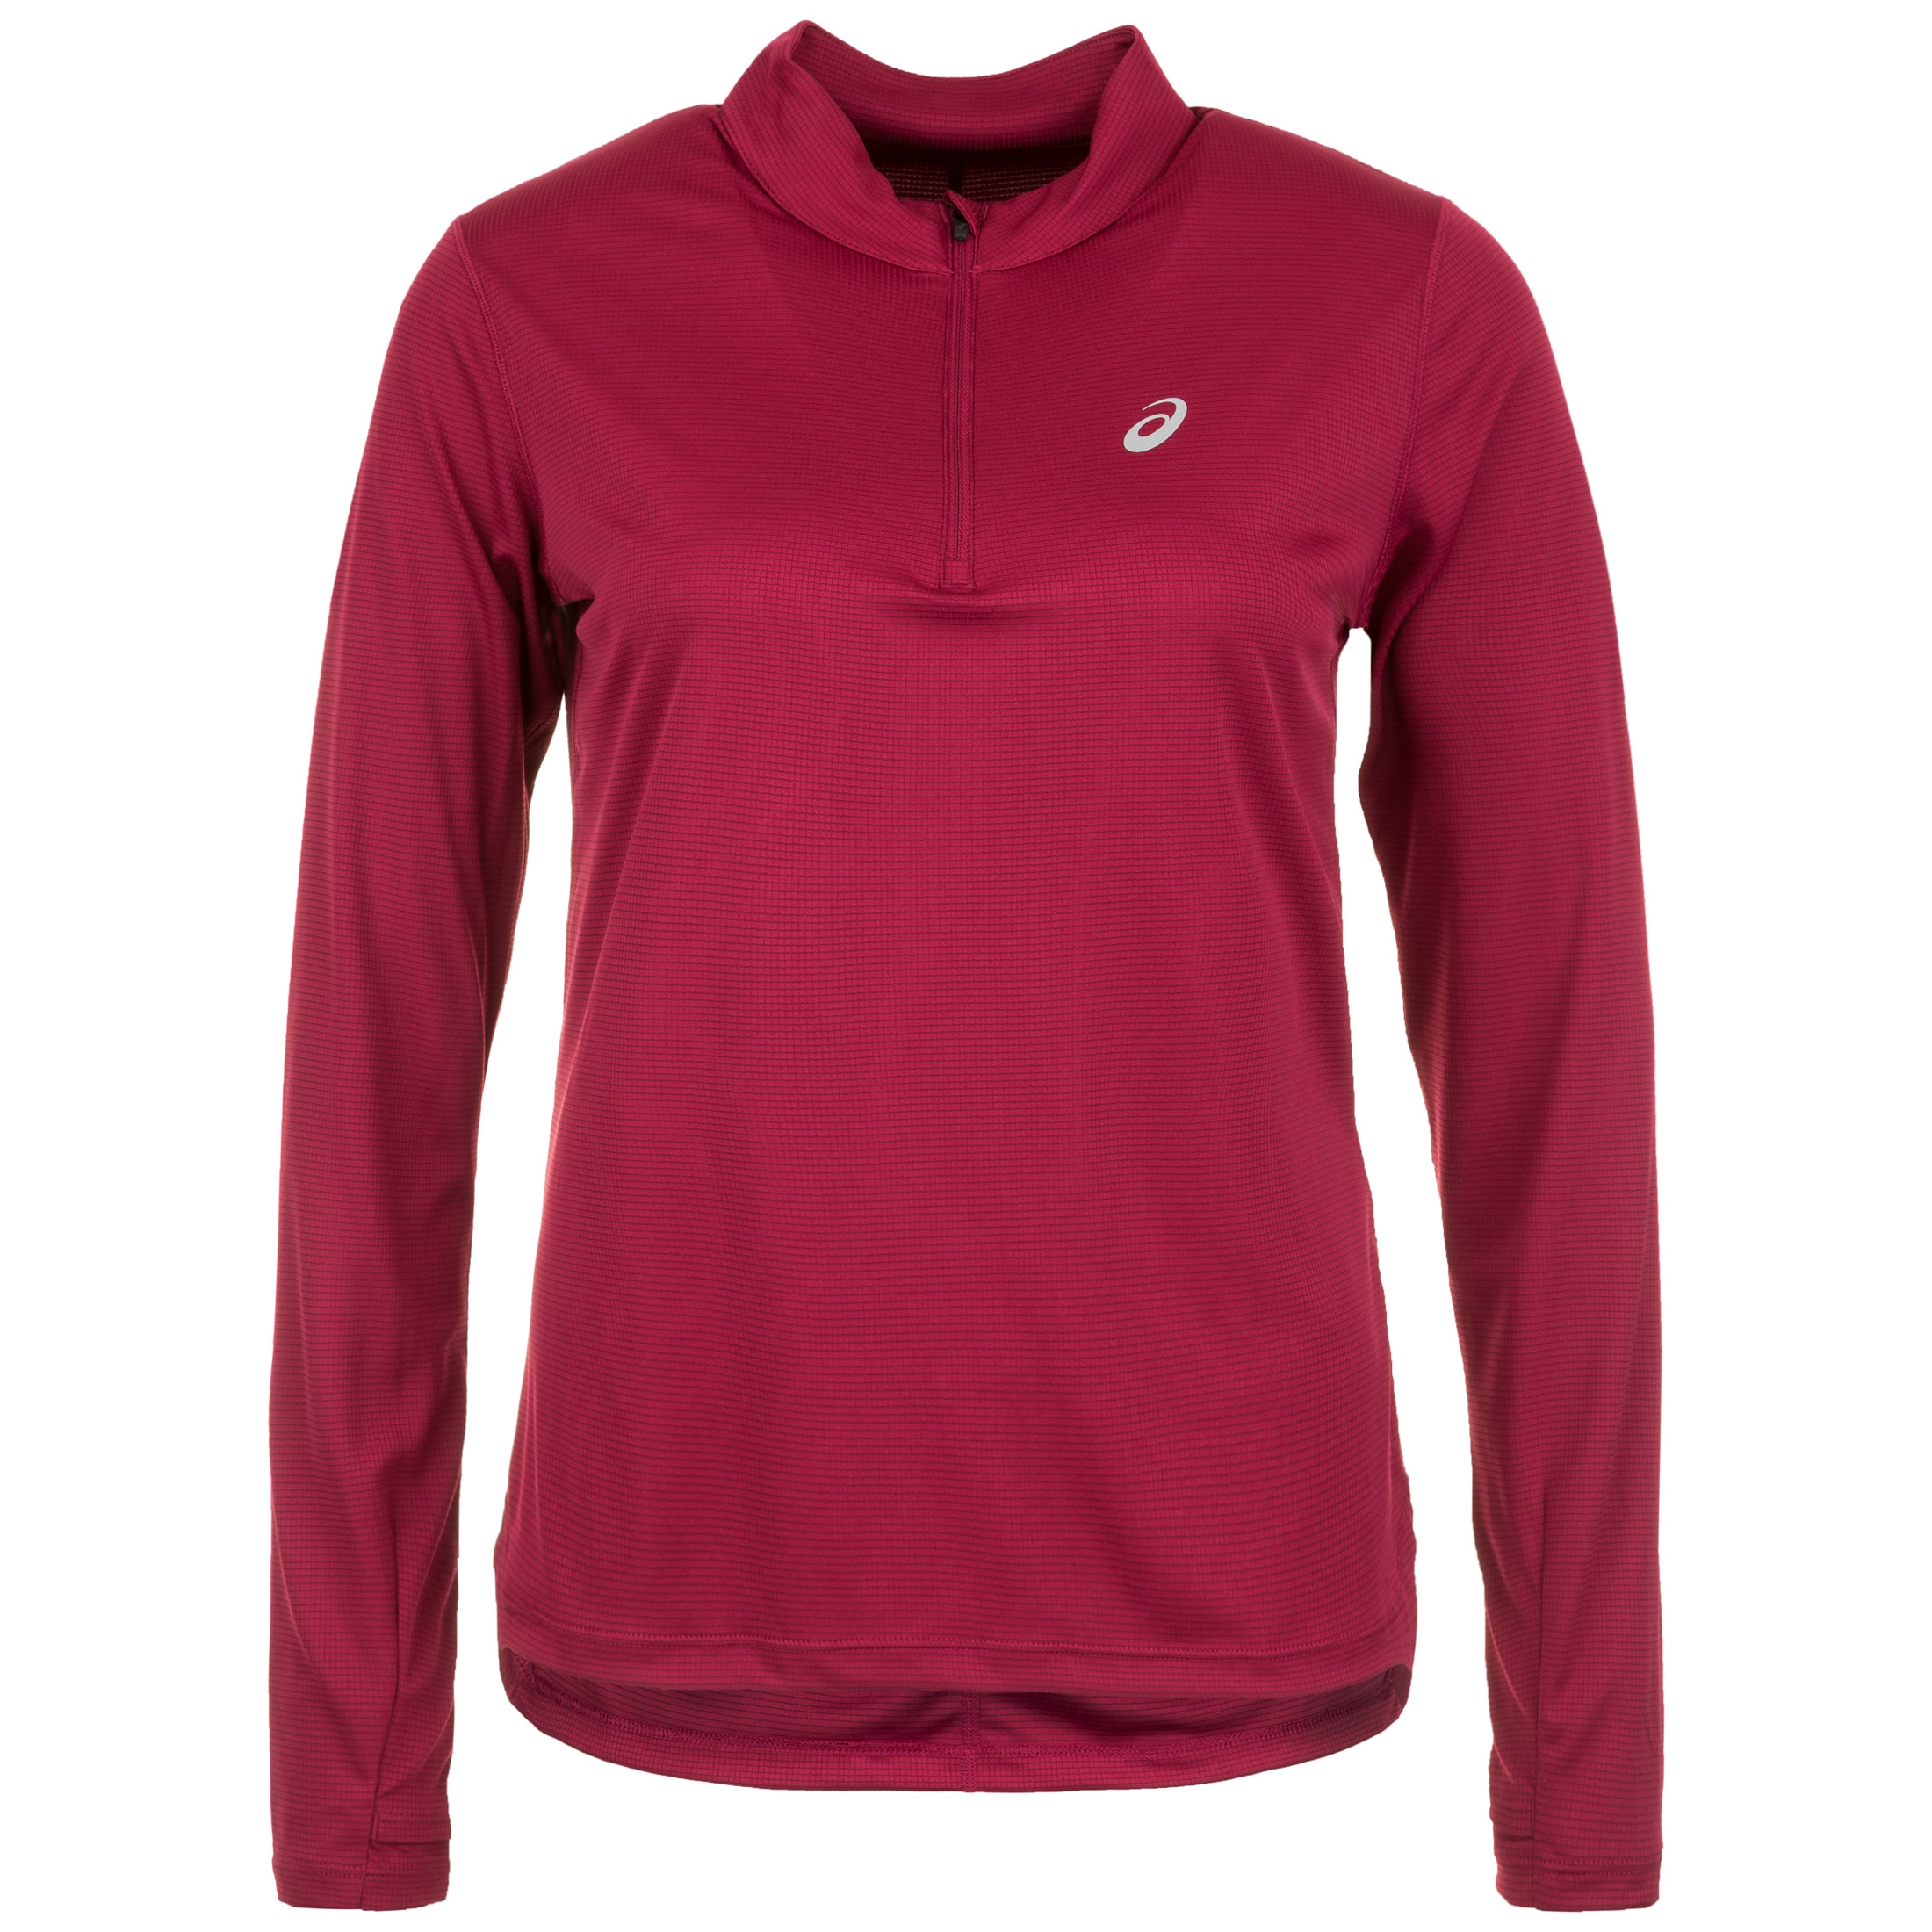 Asics Laufshirt Silver 1/2 Zip | Sportbekleidung > Sportshirts > Laufshirts | Rot | ASICS